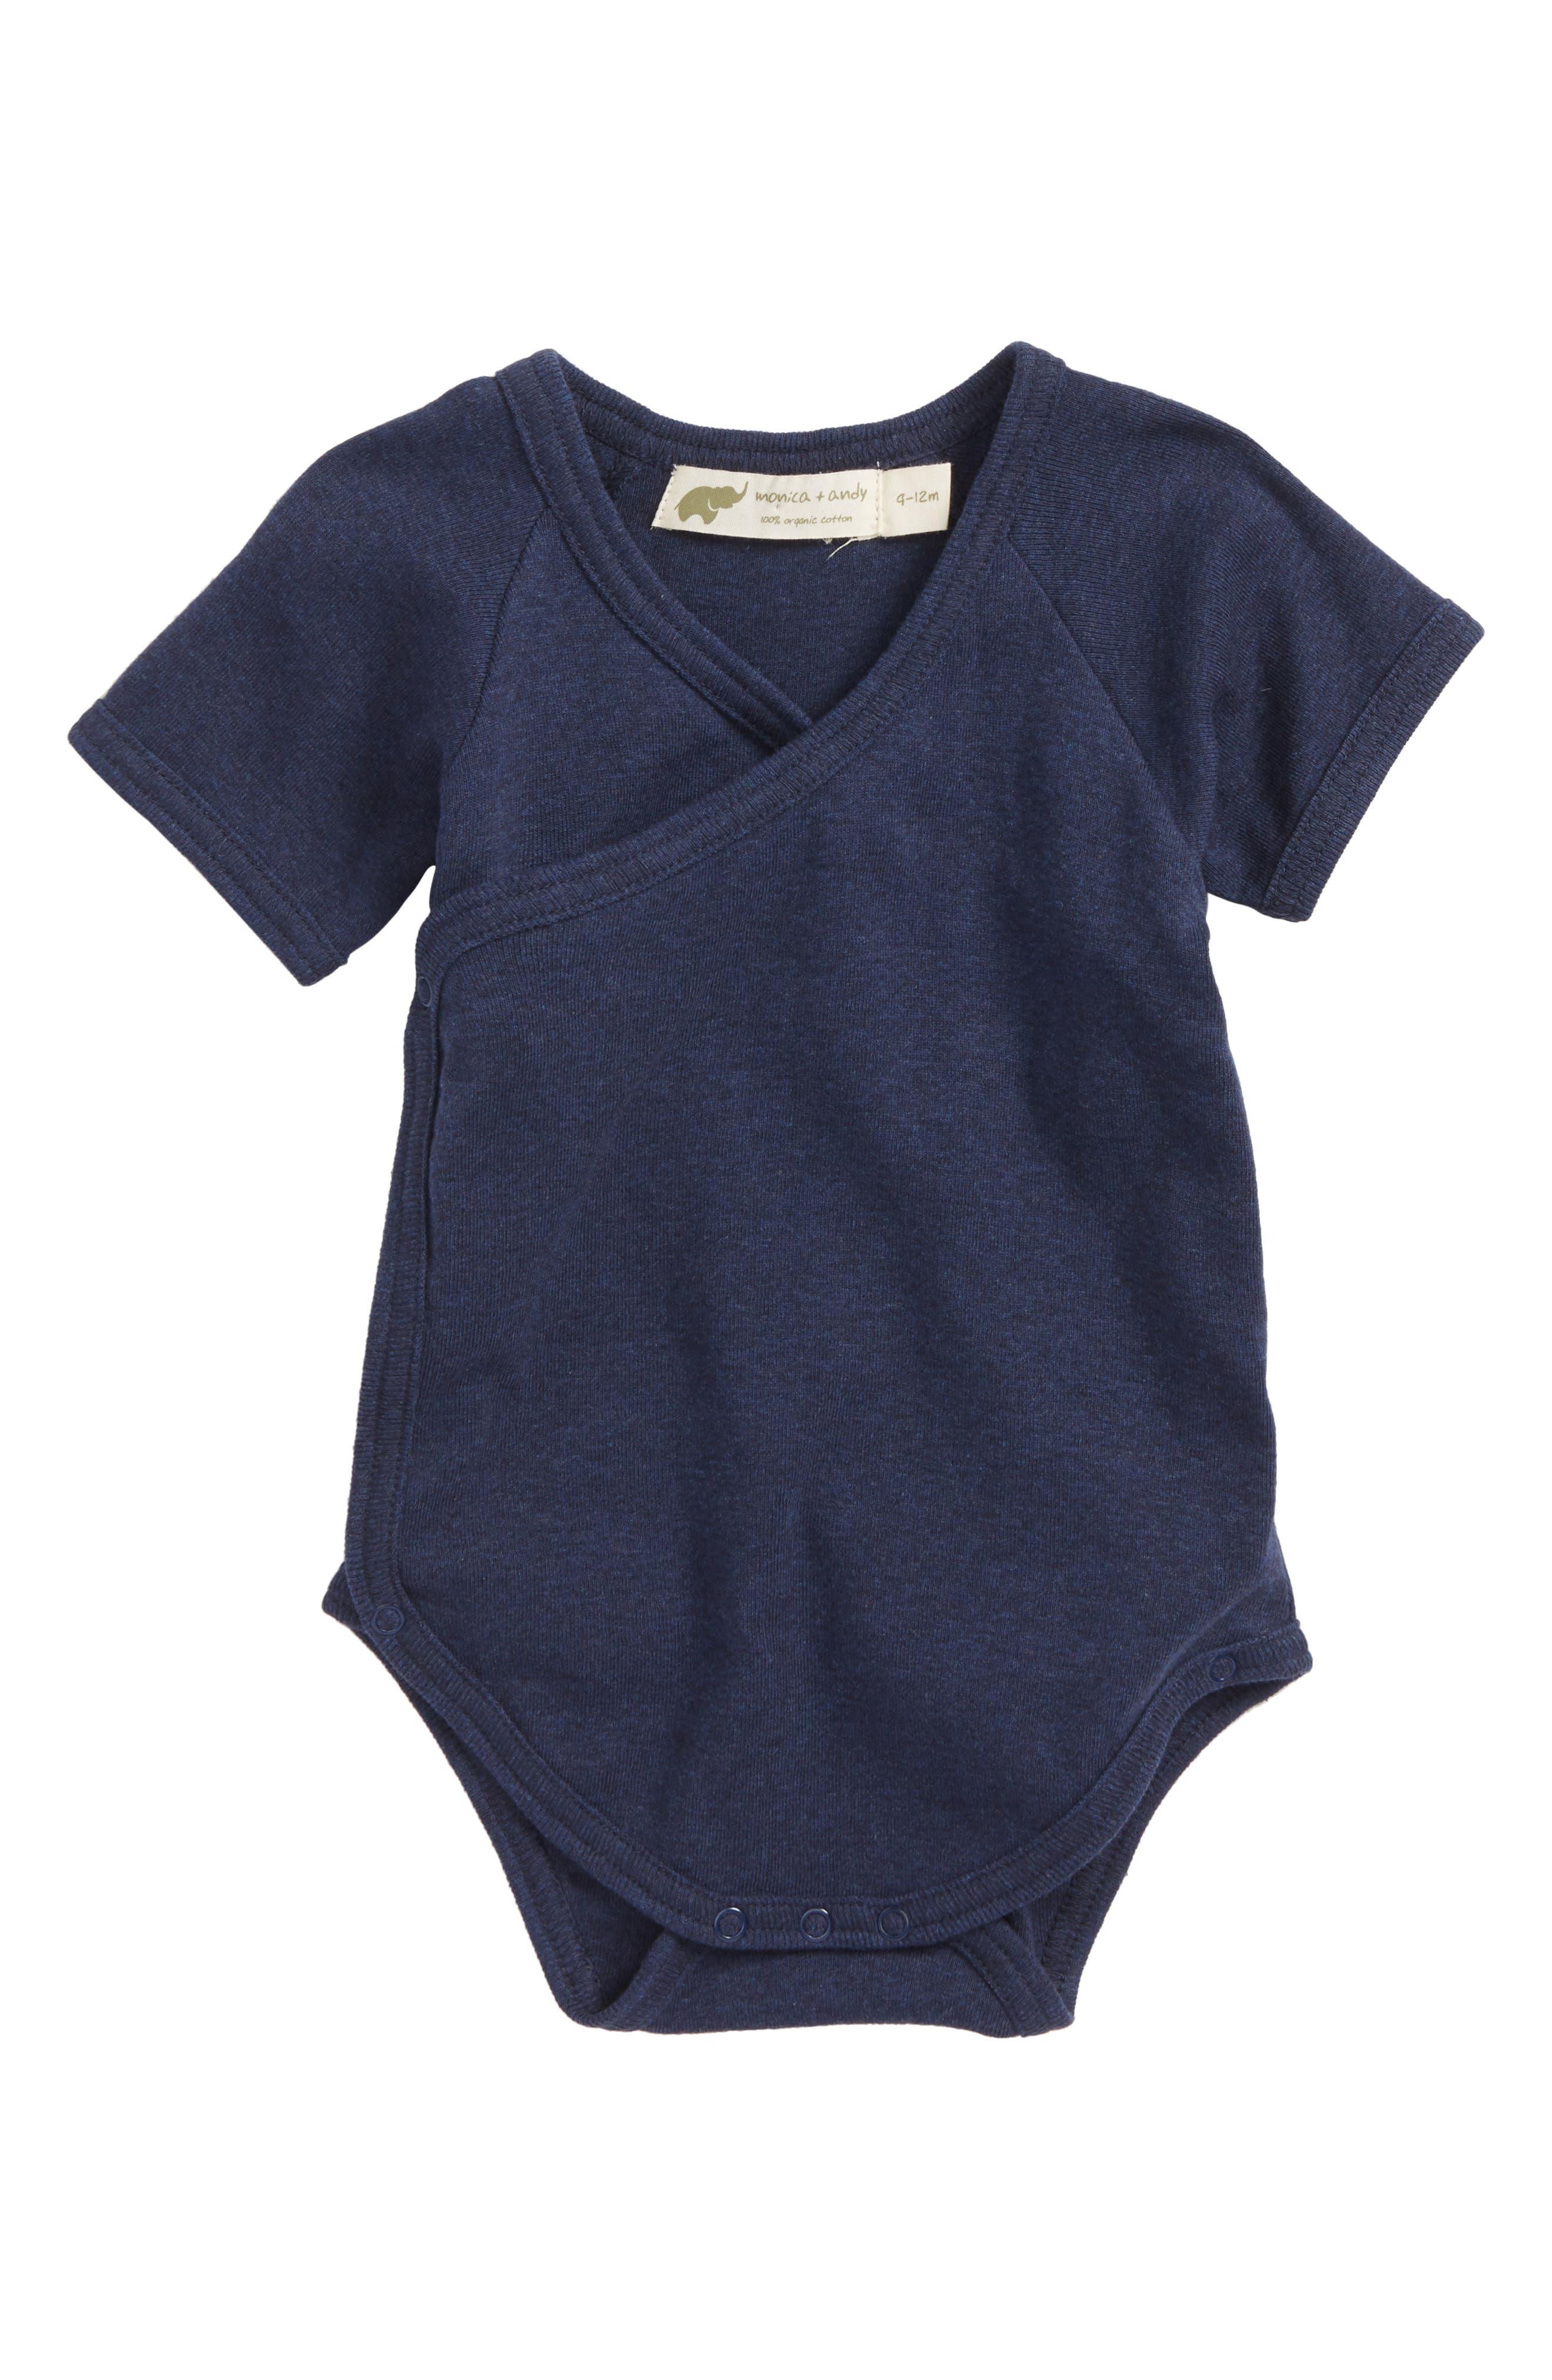 Monica + Andy Lucky Surplice Organic Cotton Bodysuit (Baby)